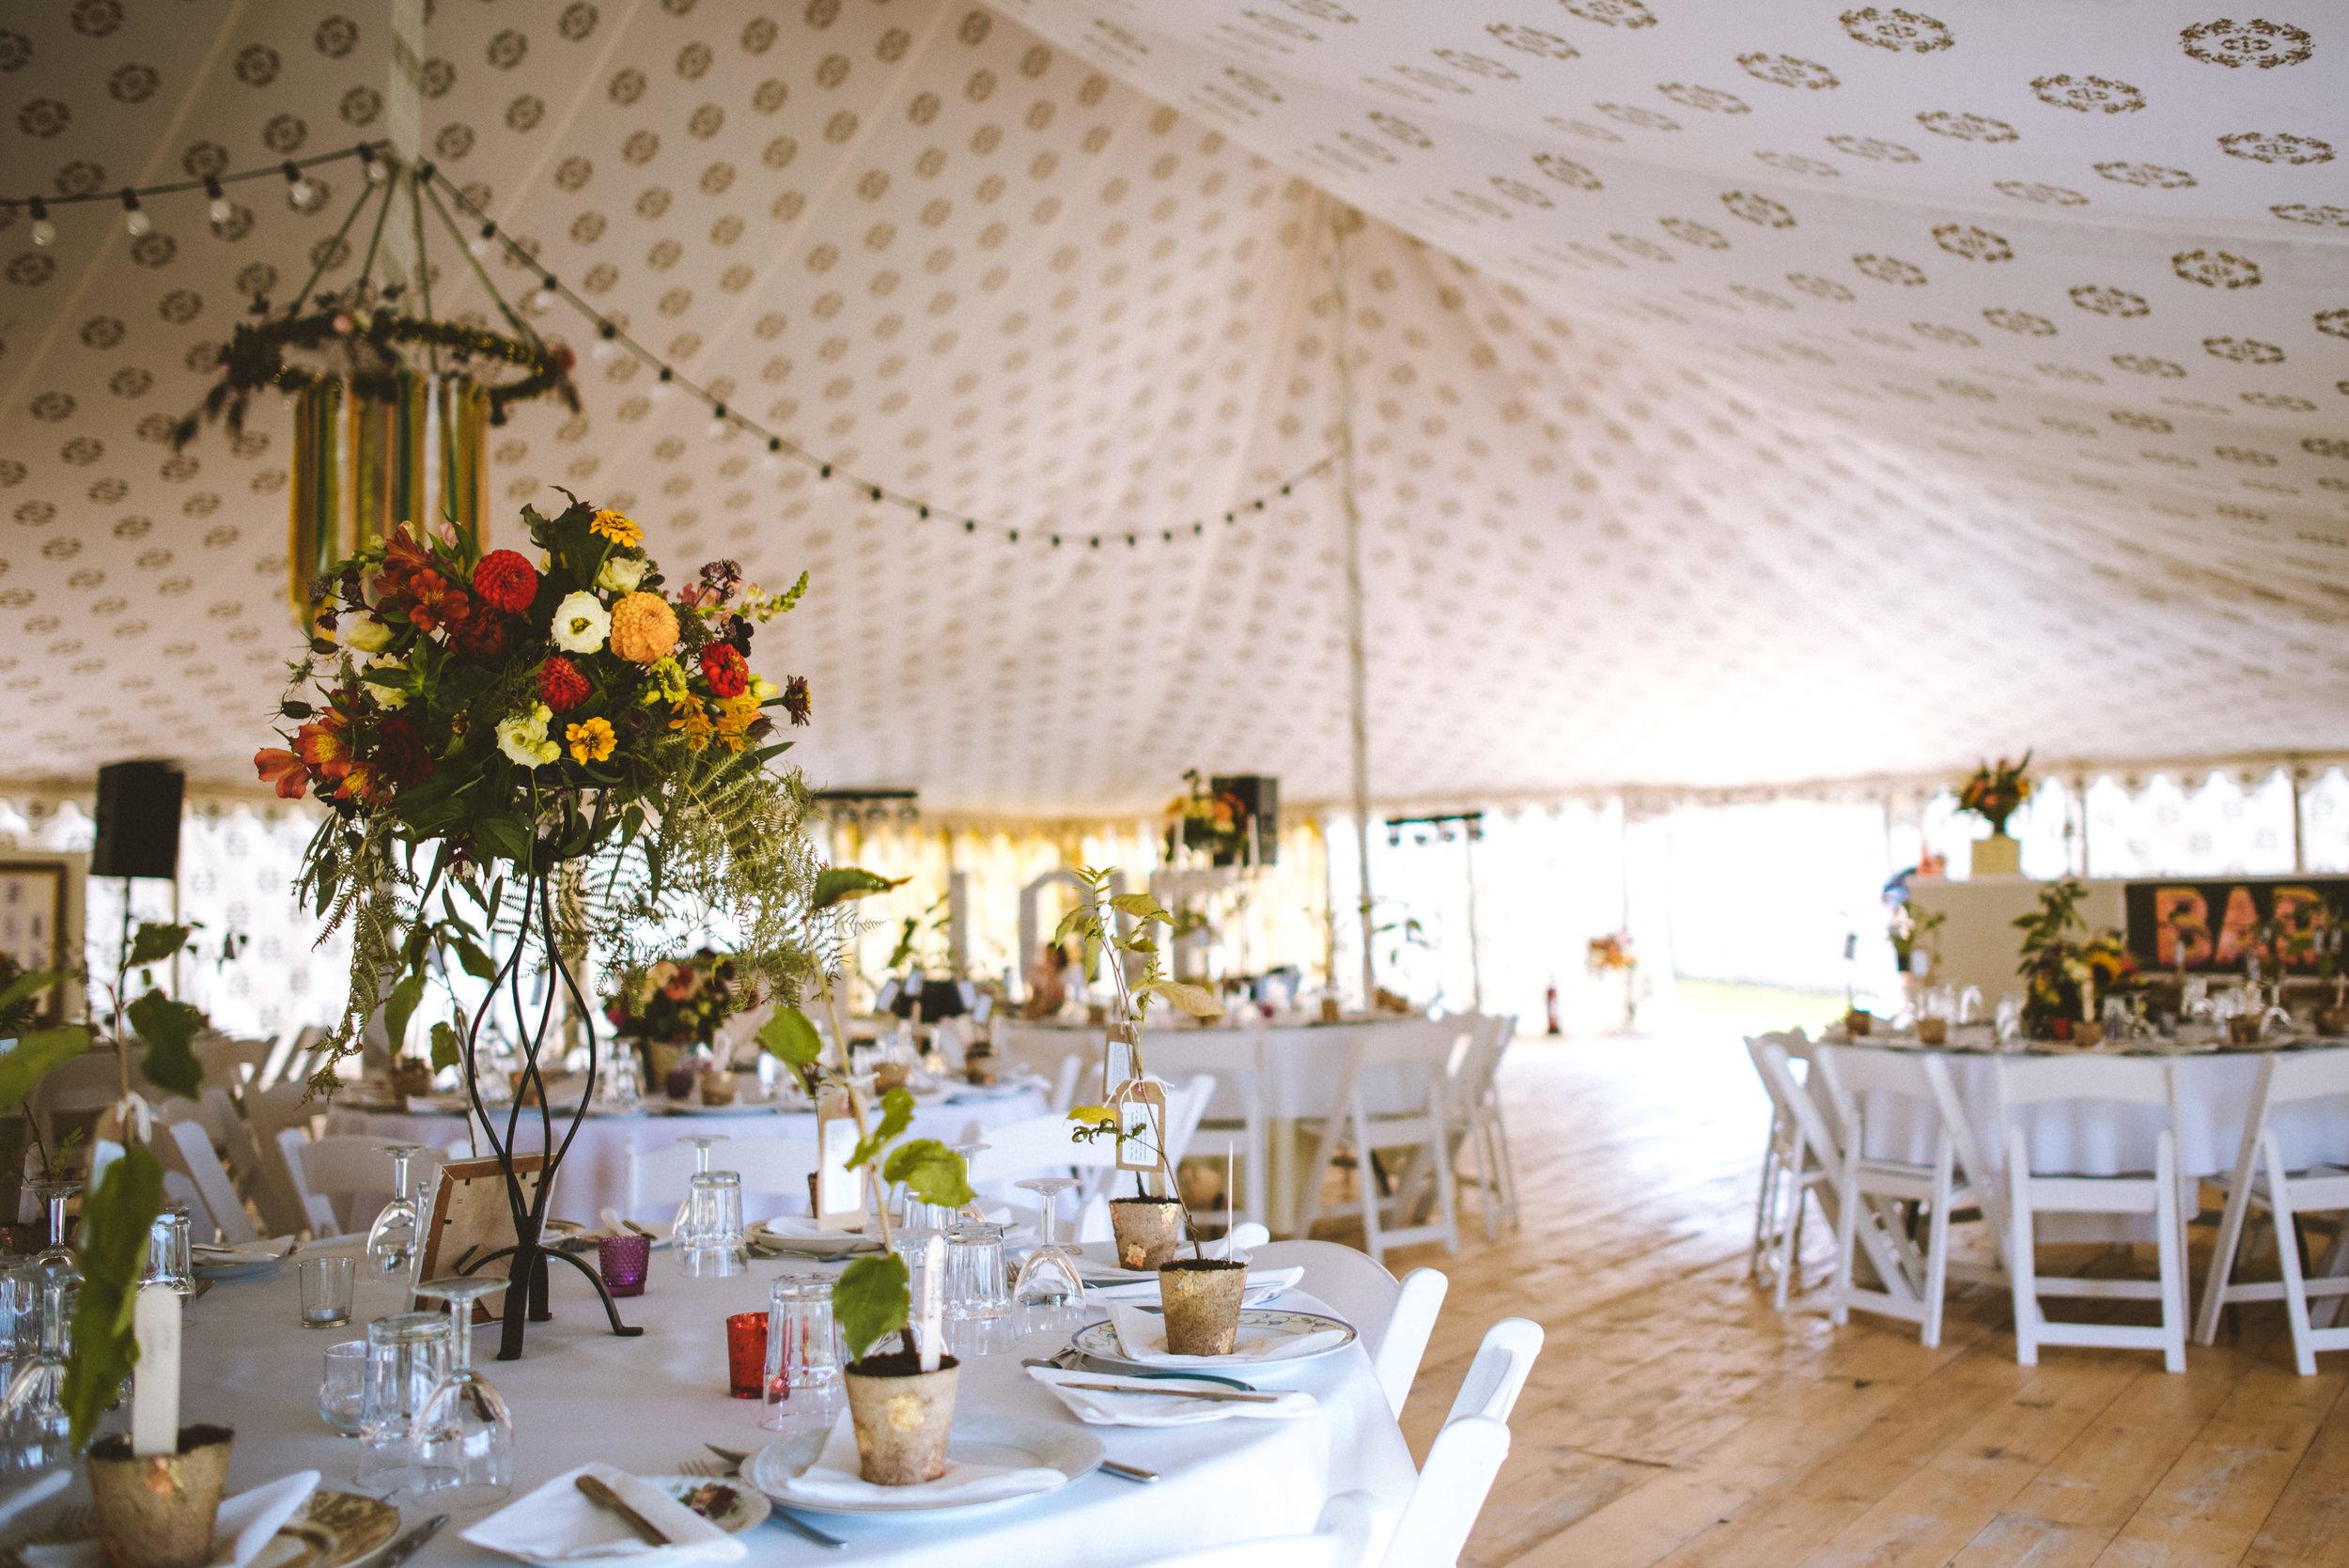 pencarrow-house-wedding-photographer-8.jpg